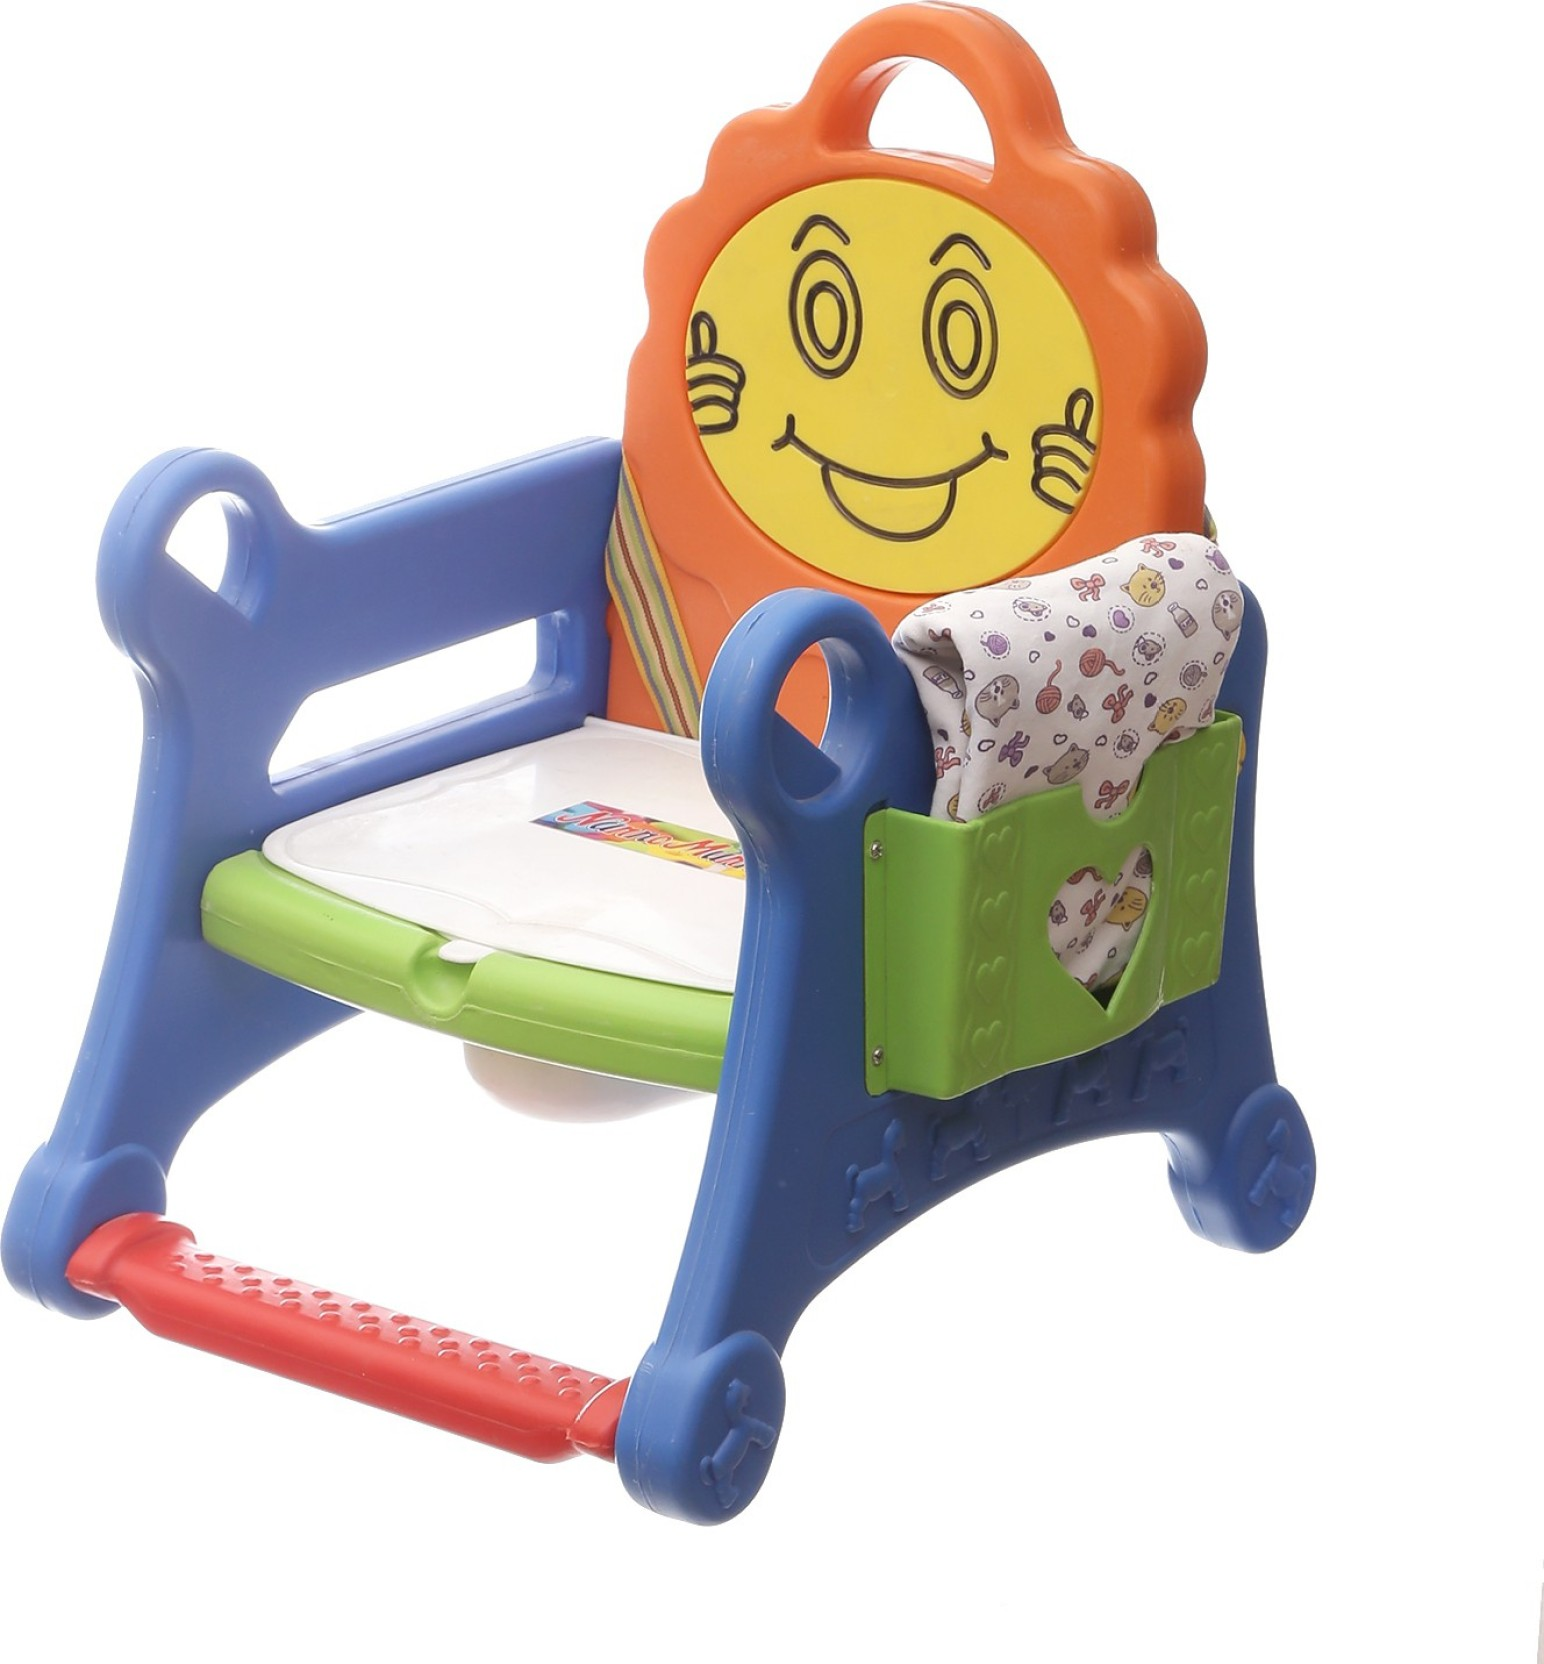 NHR NHR Baby folding Chair Potty Seat Potty Seat Plastic Potty